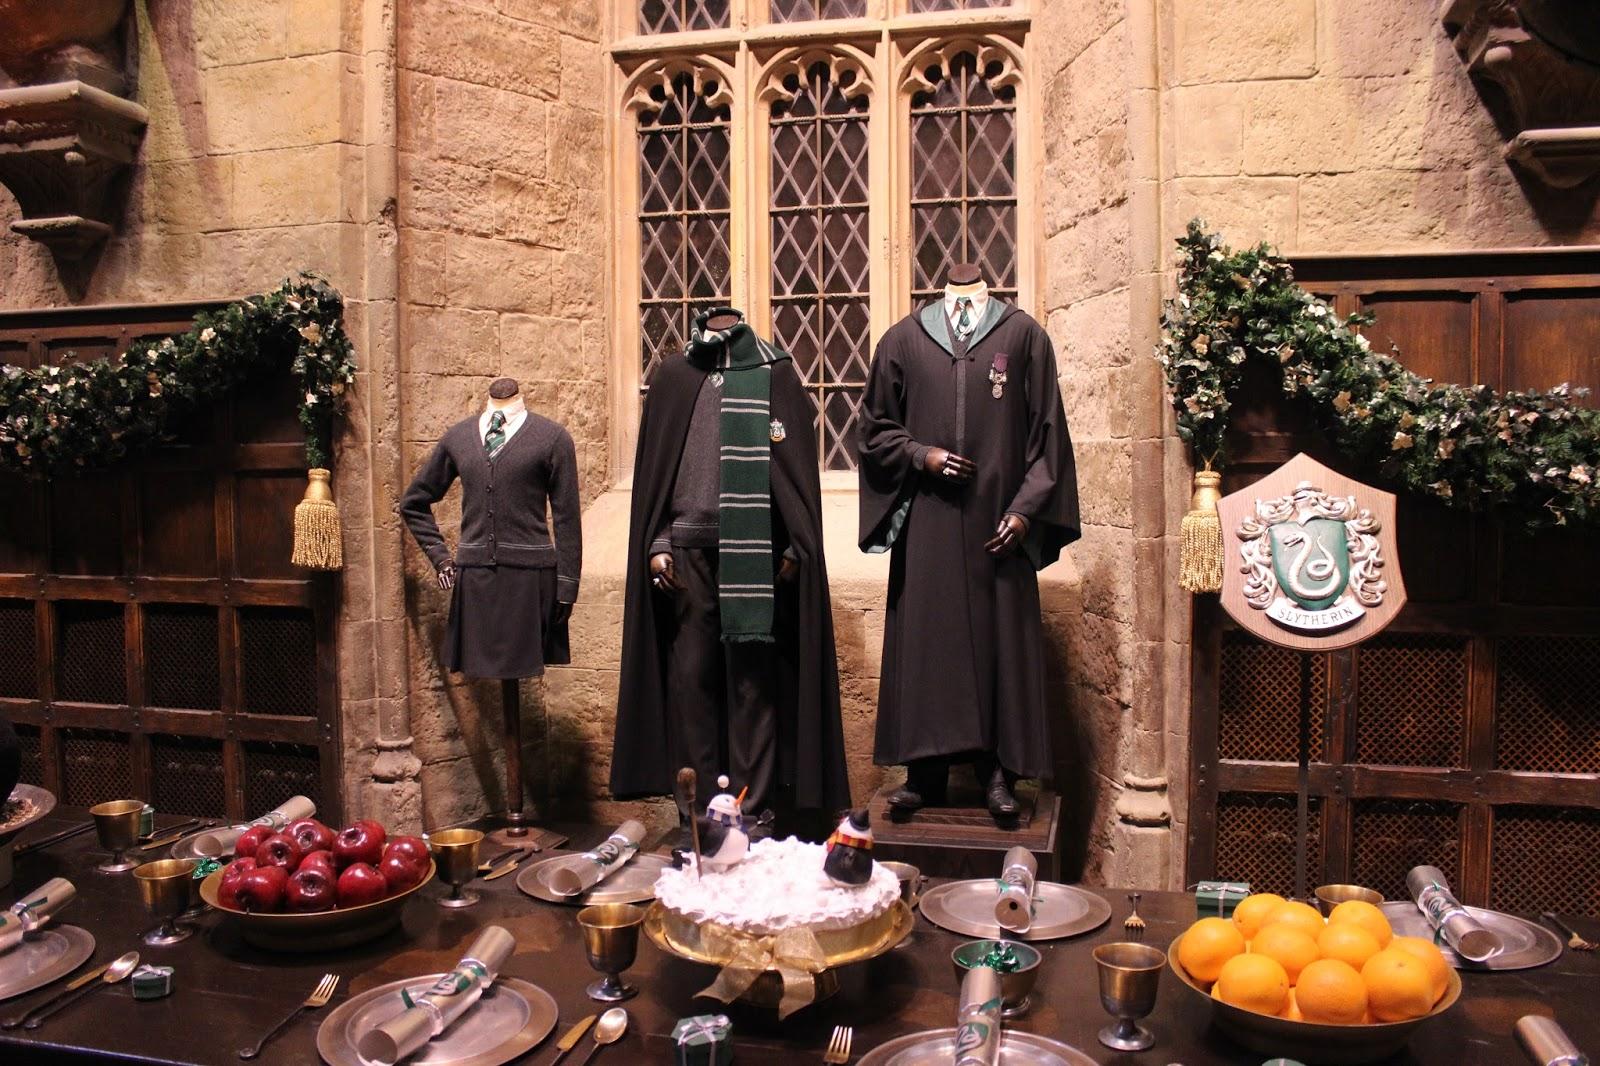 Harry Potter studio tour london great hall costumes